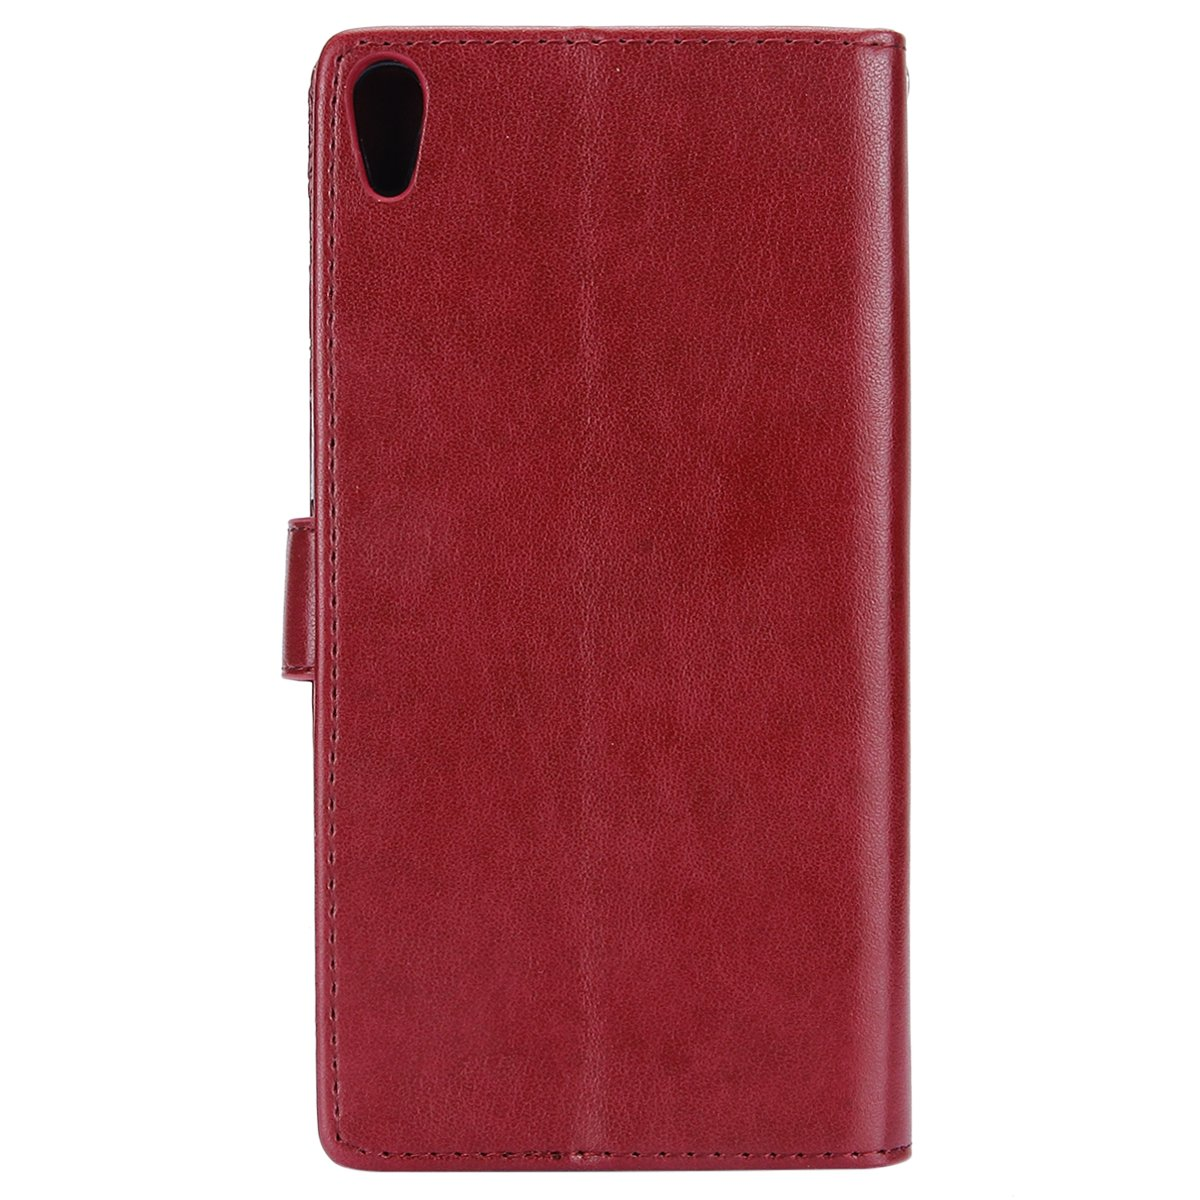 Felfy Kompatibel mit Xperia XA Ultra Handyh/ülle Leder Tasche Schutzh/ülle Brieftasche Handytasche Lederh/ülle mit 3D Creative Glitzer Strass Eule Mandala Muster Klapph/ülle mit Kartenfach,Rosegold